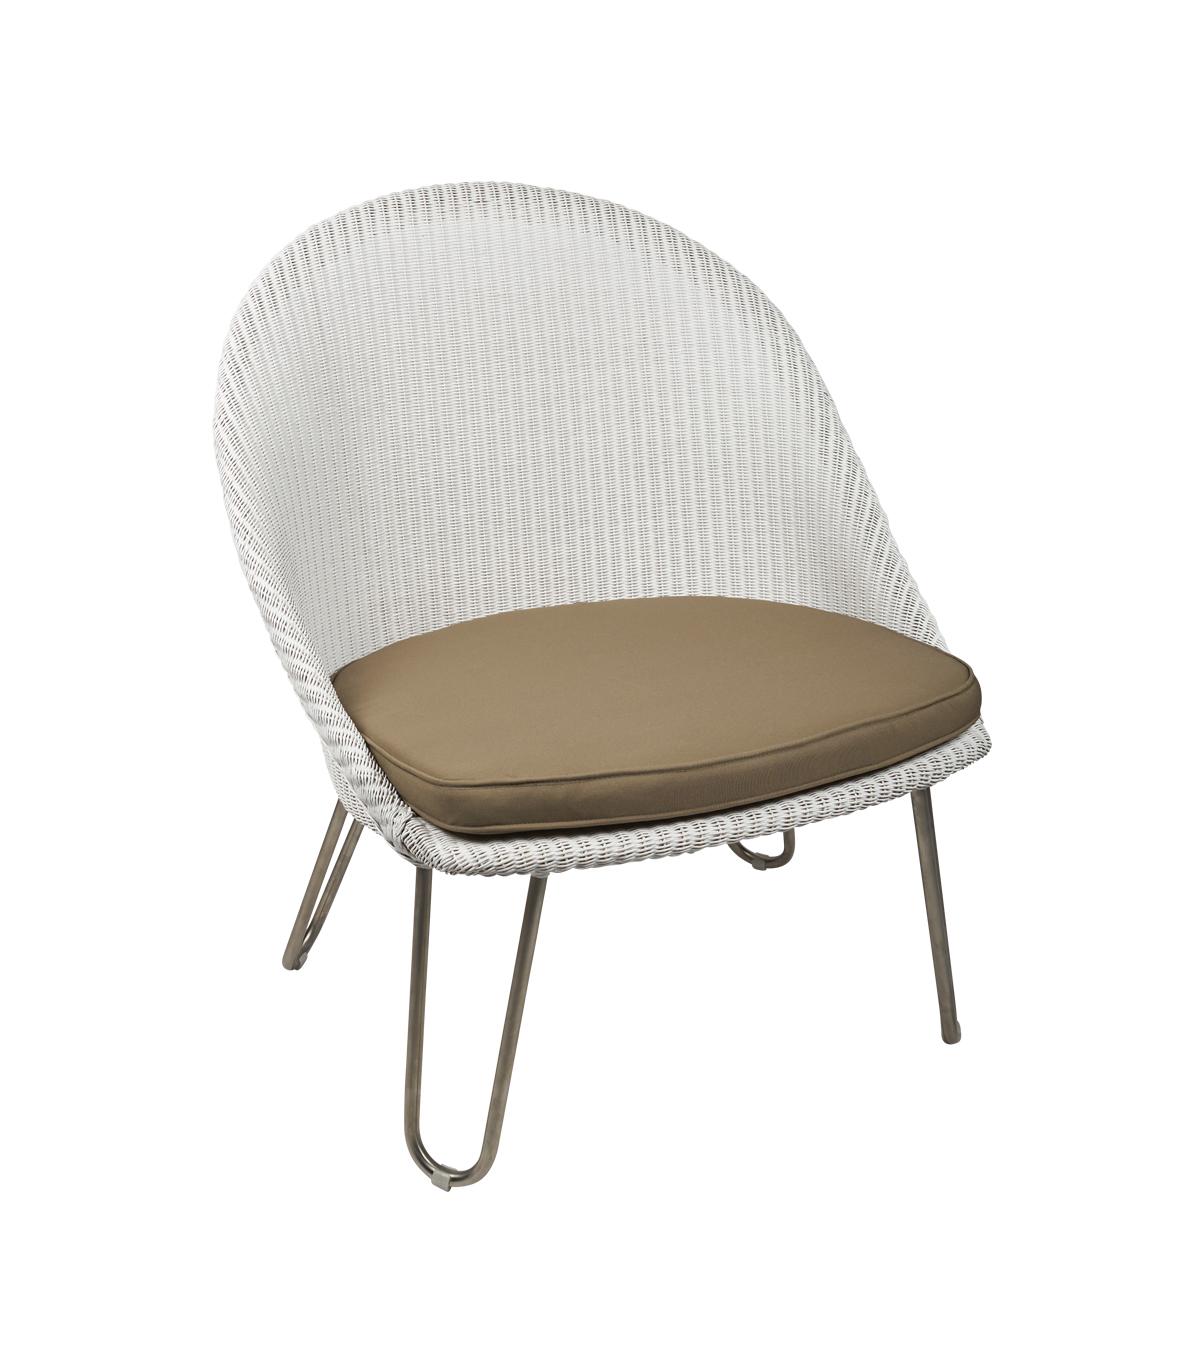 Lloyd loom fauteuil Bristol